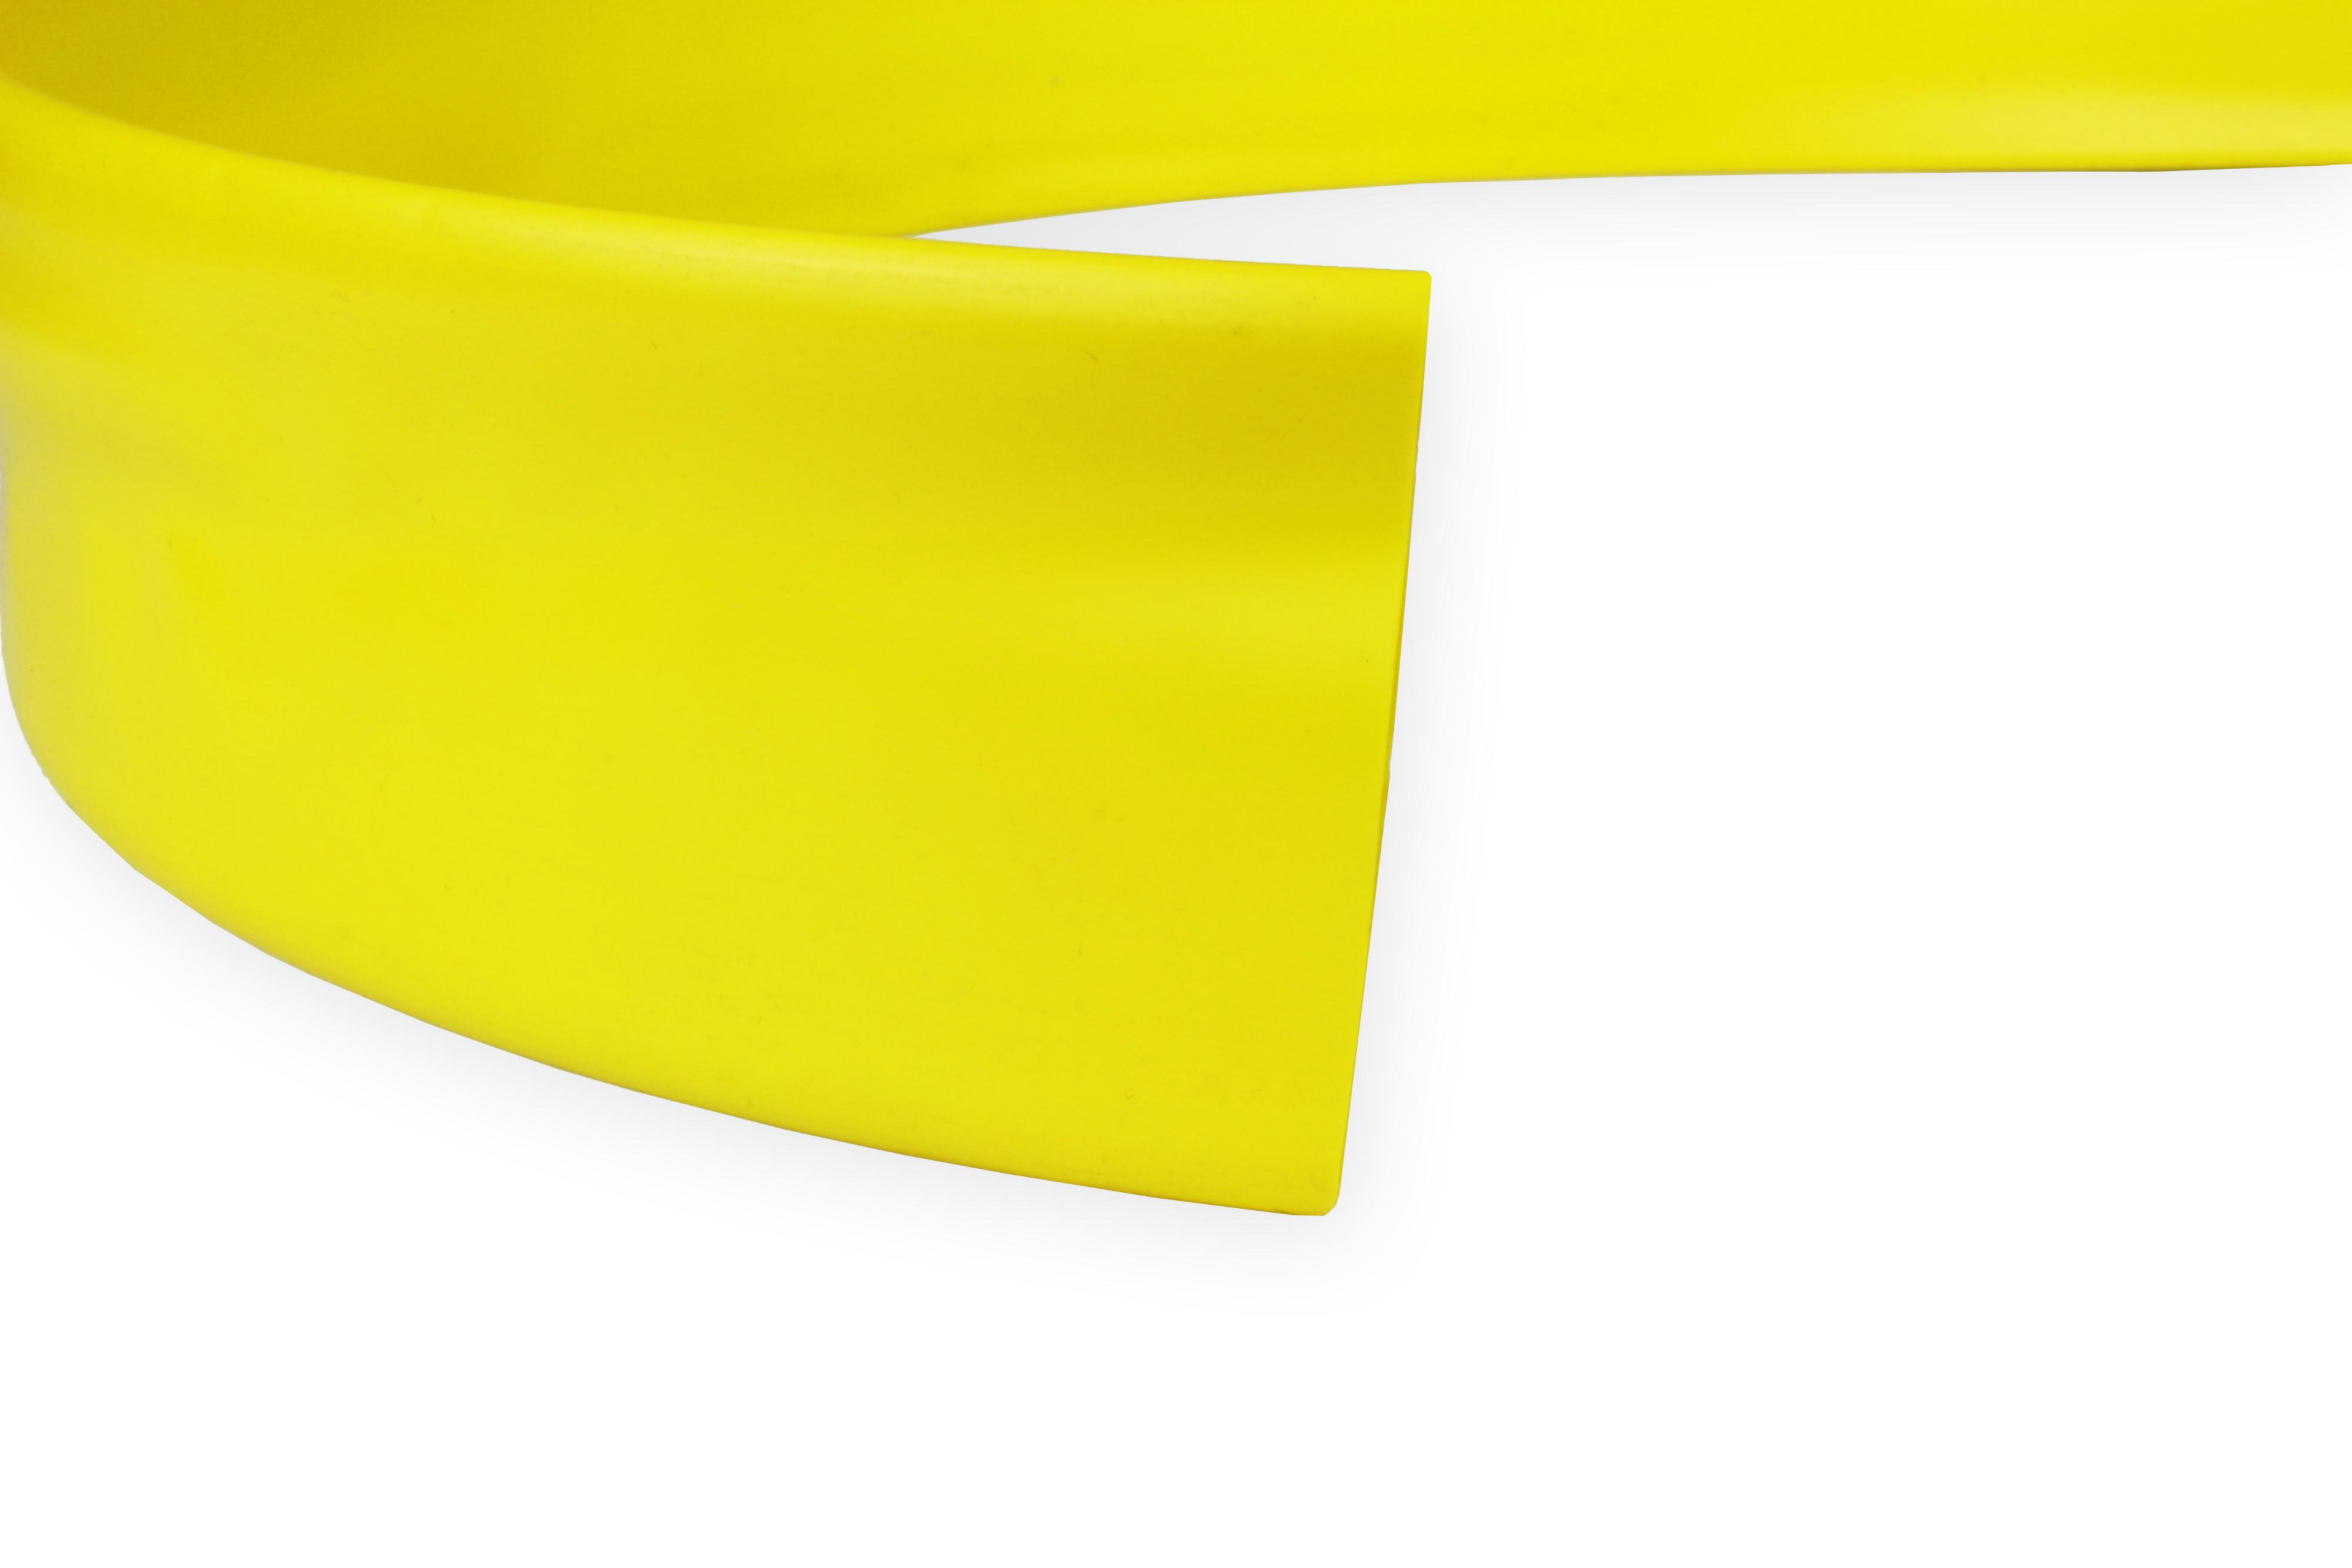 PVC Heat Shrink Tubing HPV Size 76.2mm I.D / 49.0mm I.D Yellow